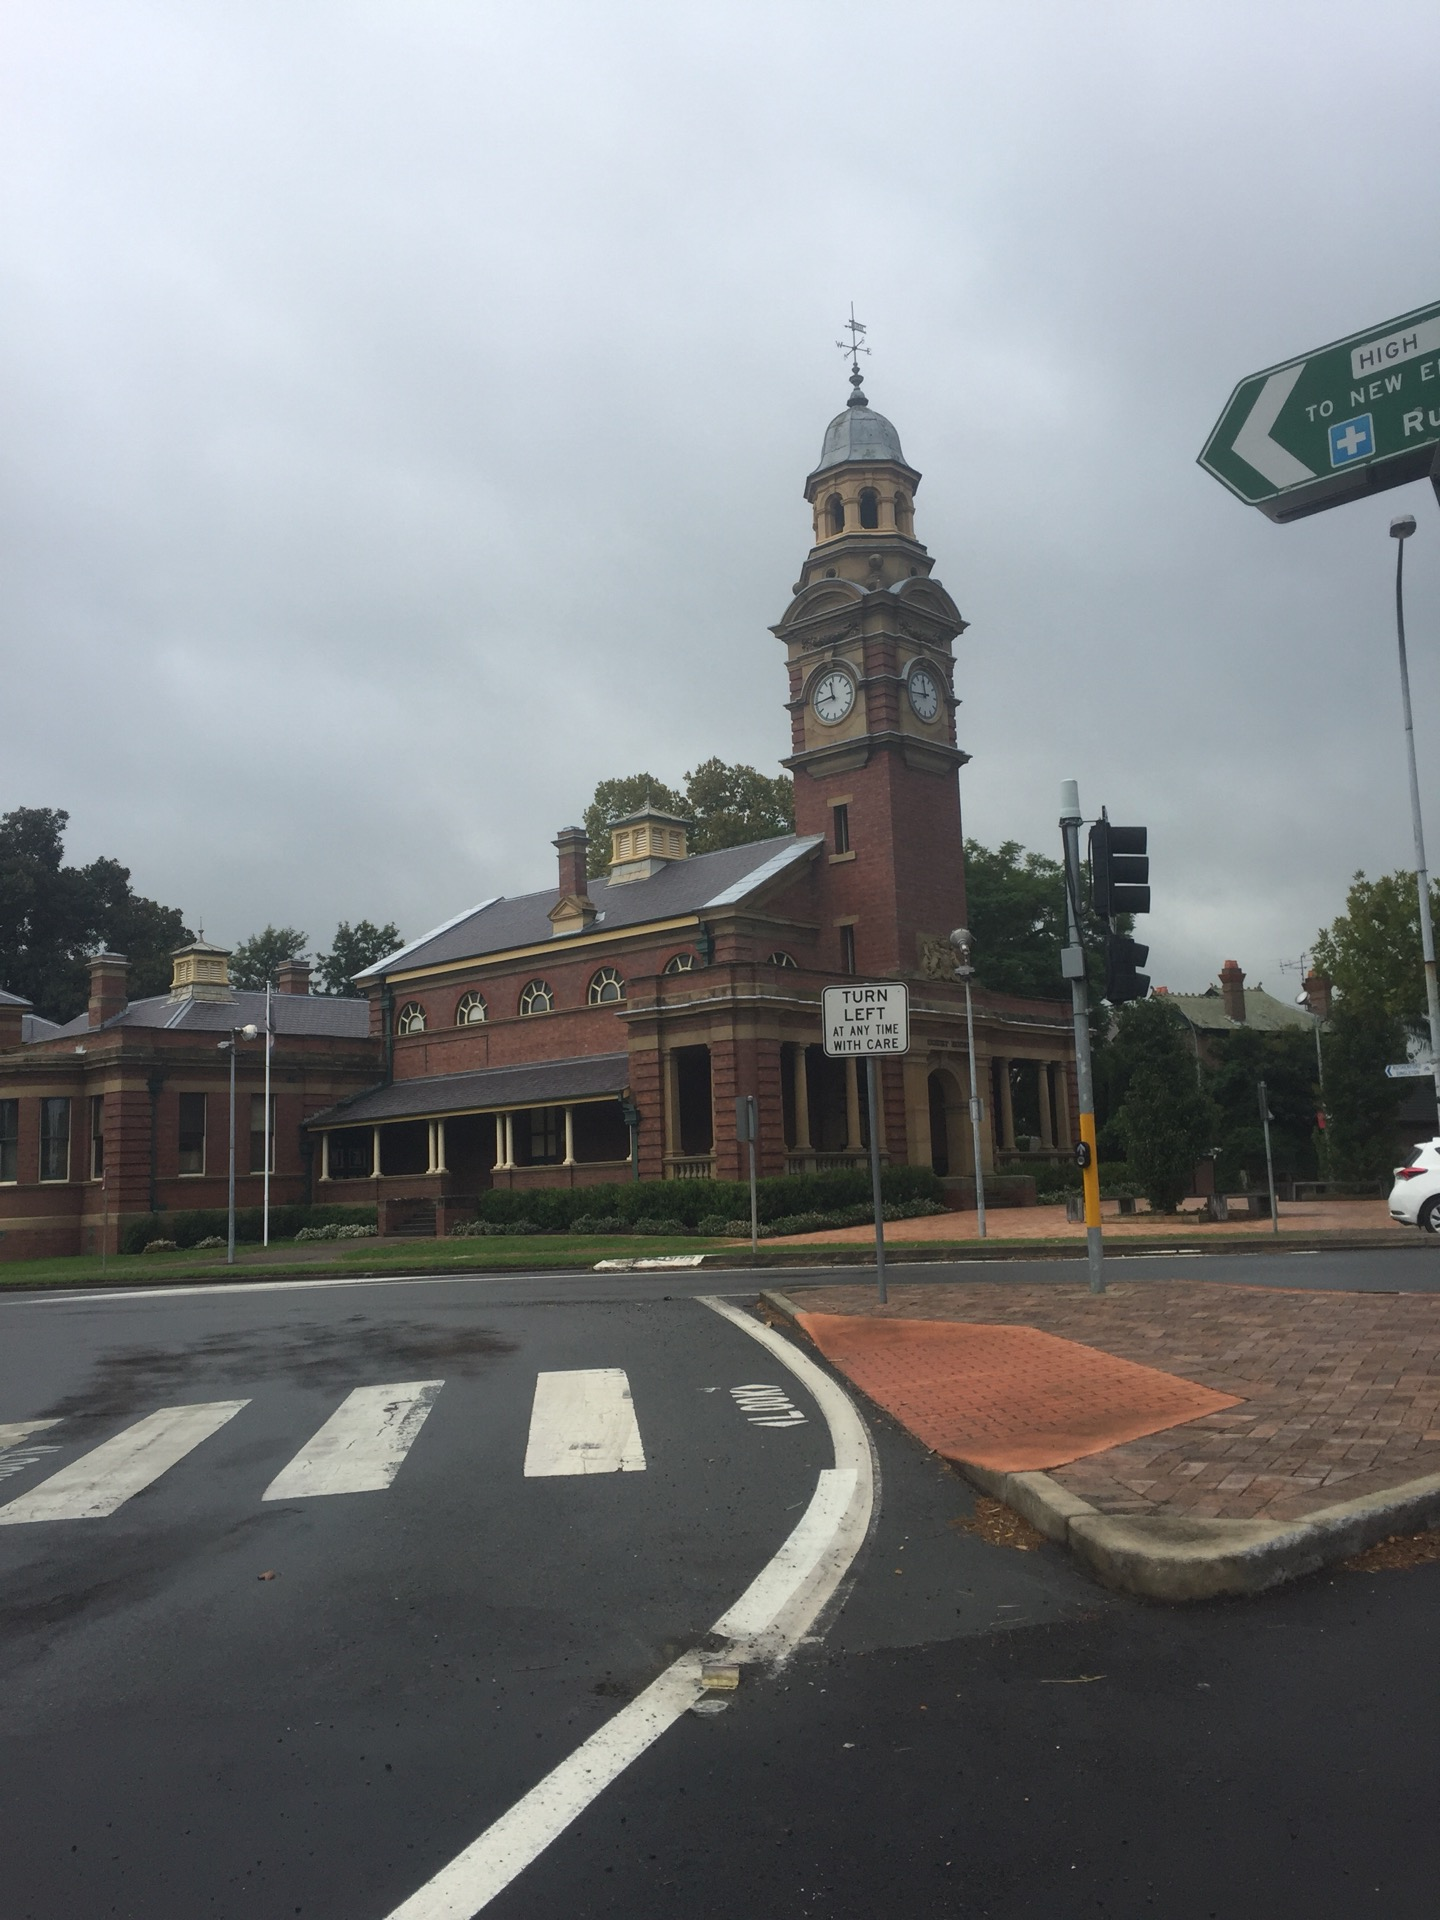 Maitland City Council   285 - 287 High Street, Maitland, New South Wales 2320   +61 2 4934 9700